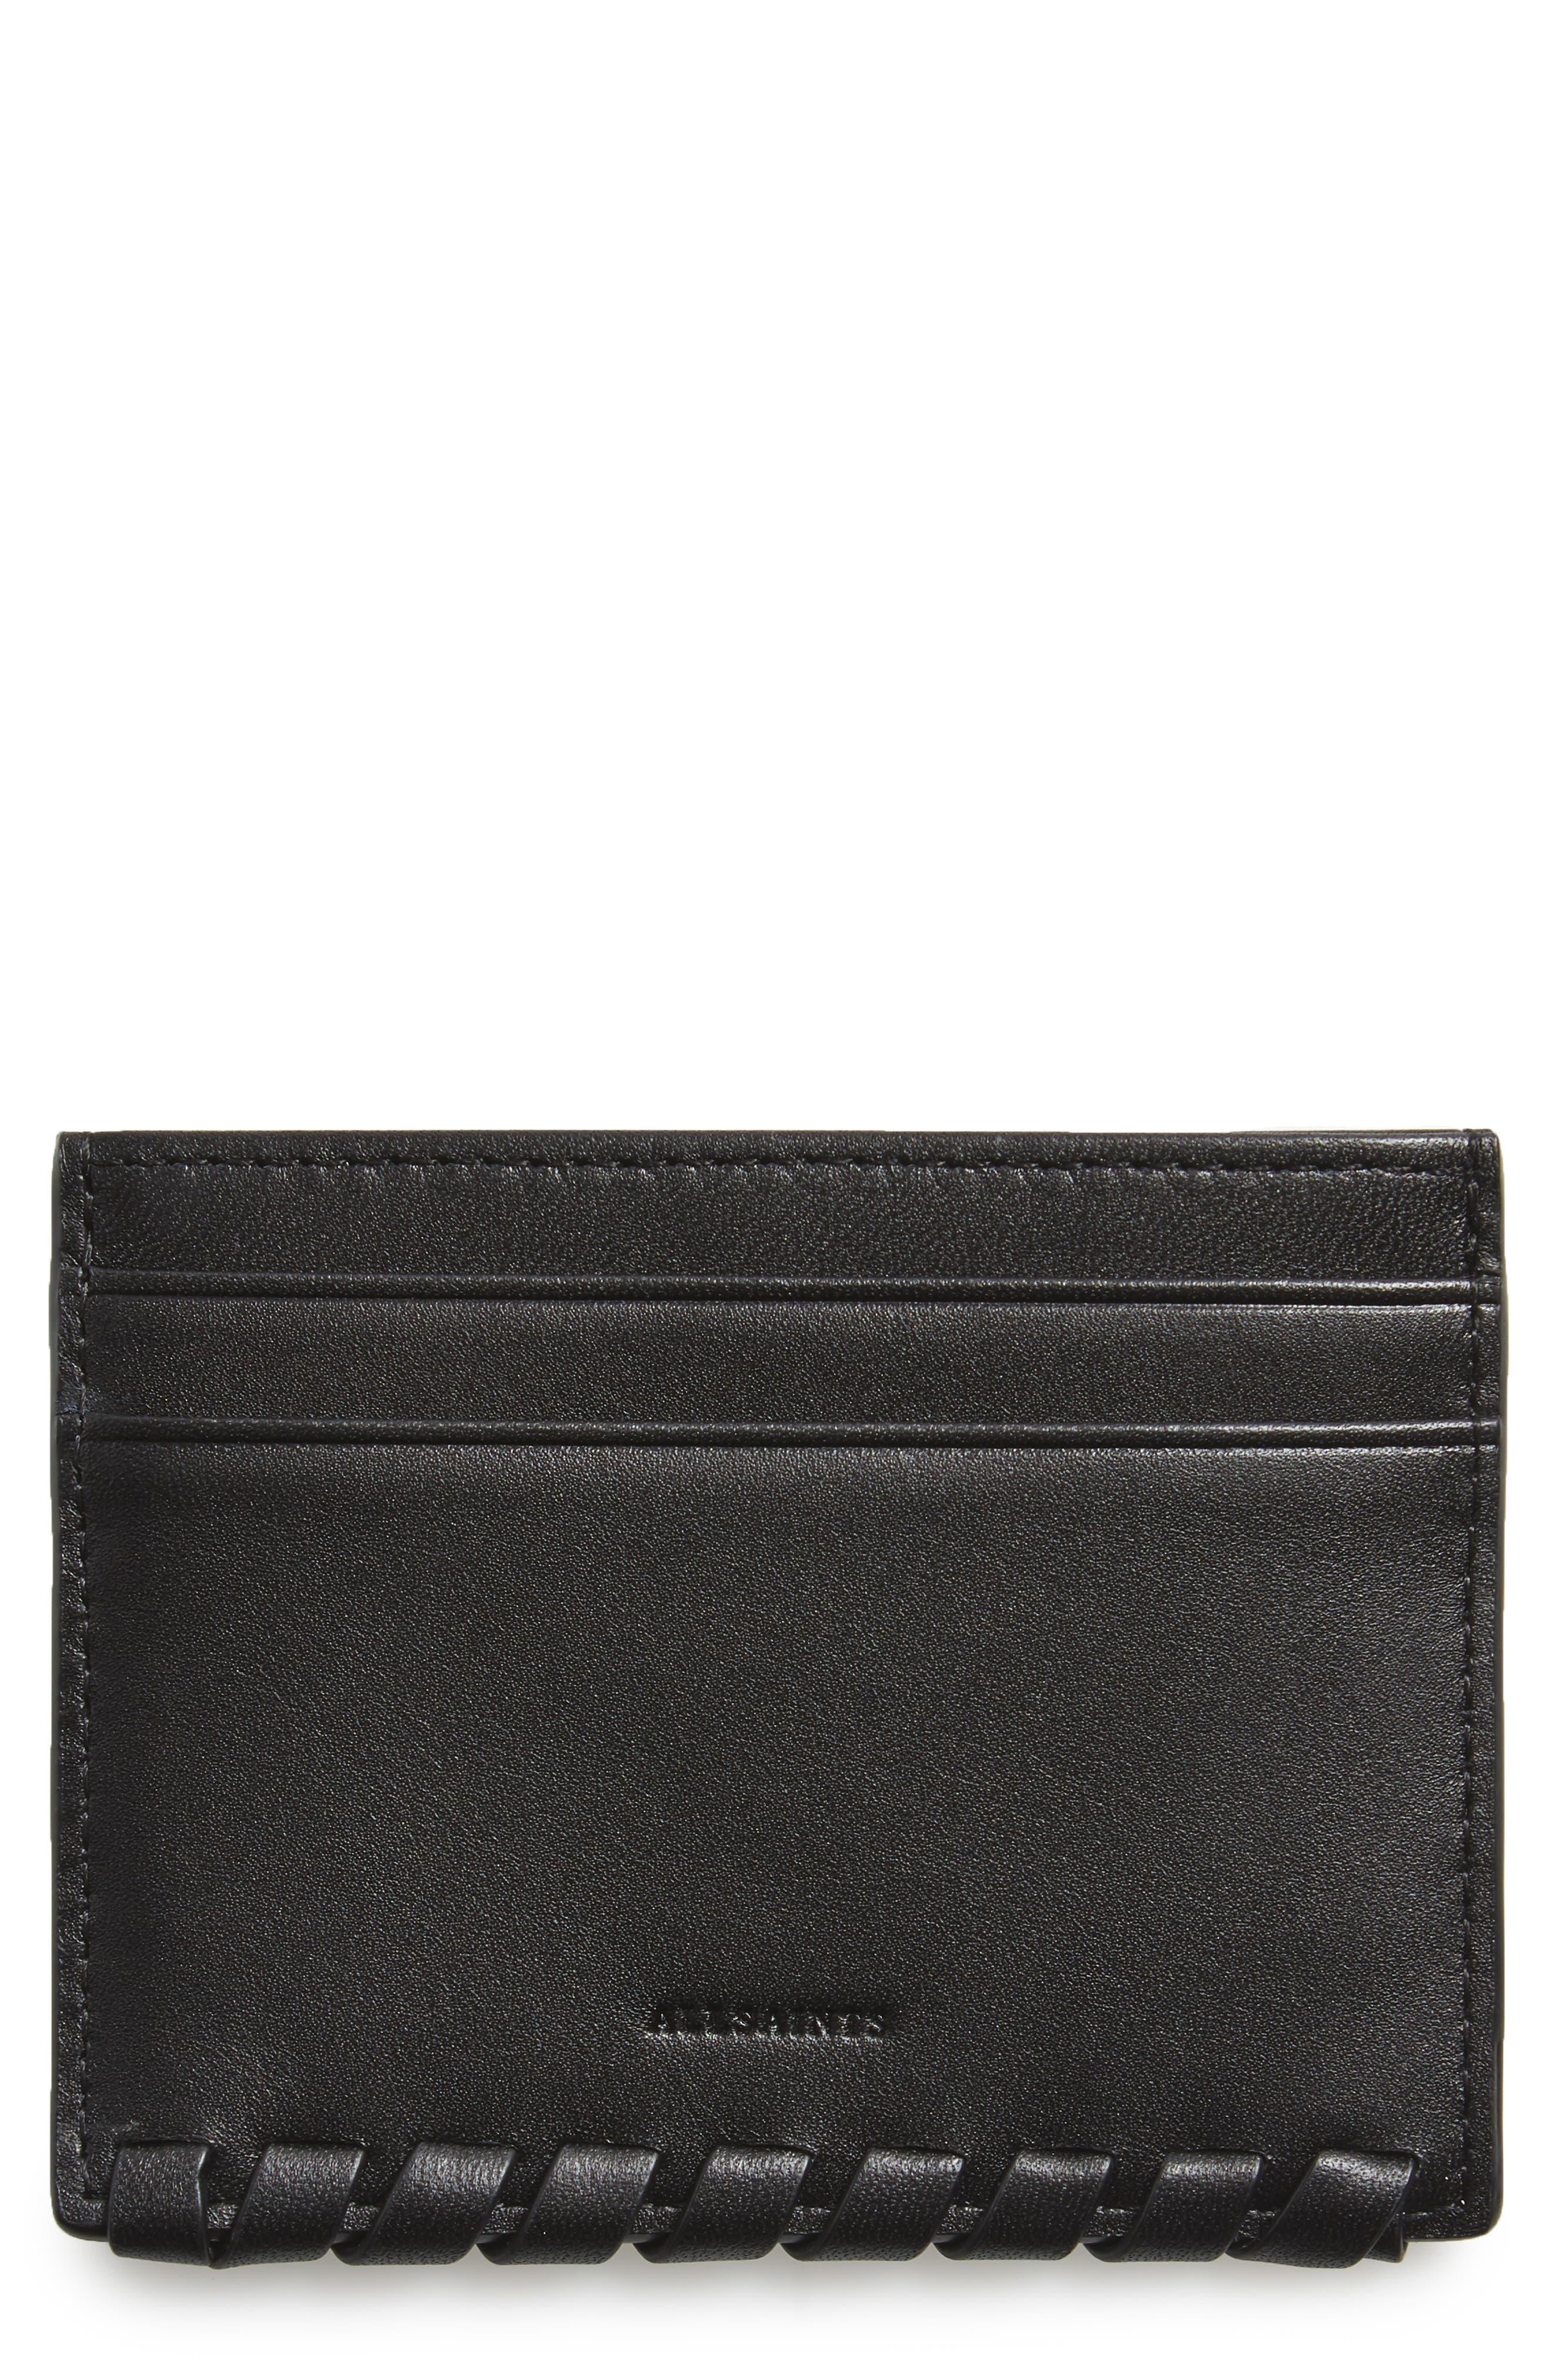 ALLSAINTS Kita Pebbled Leather Card Case